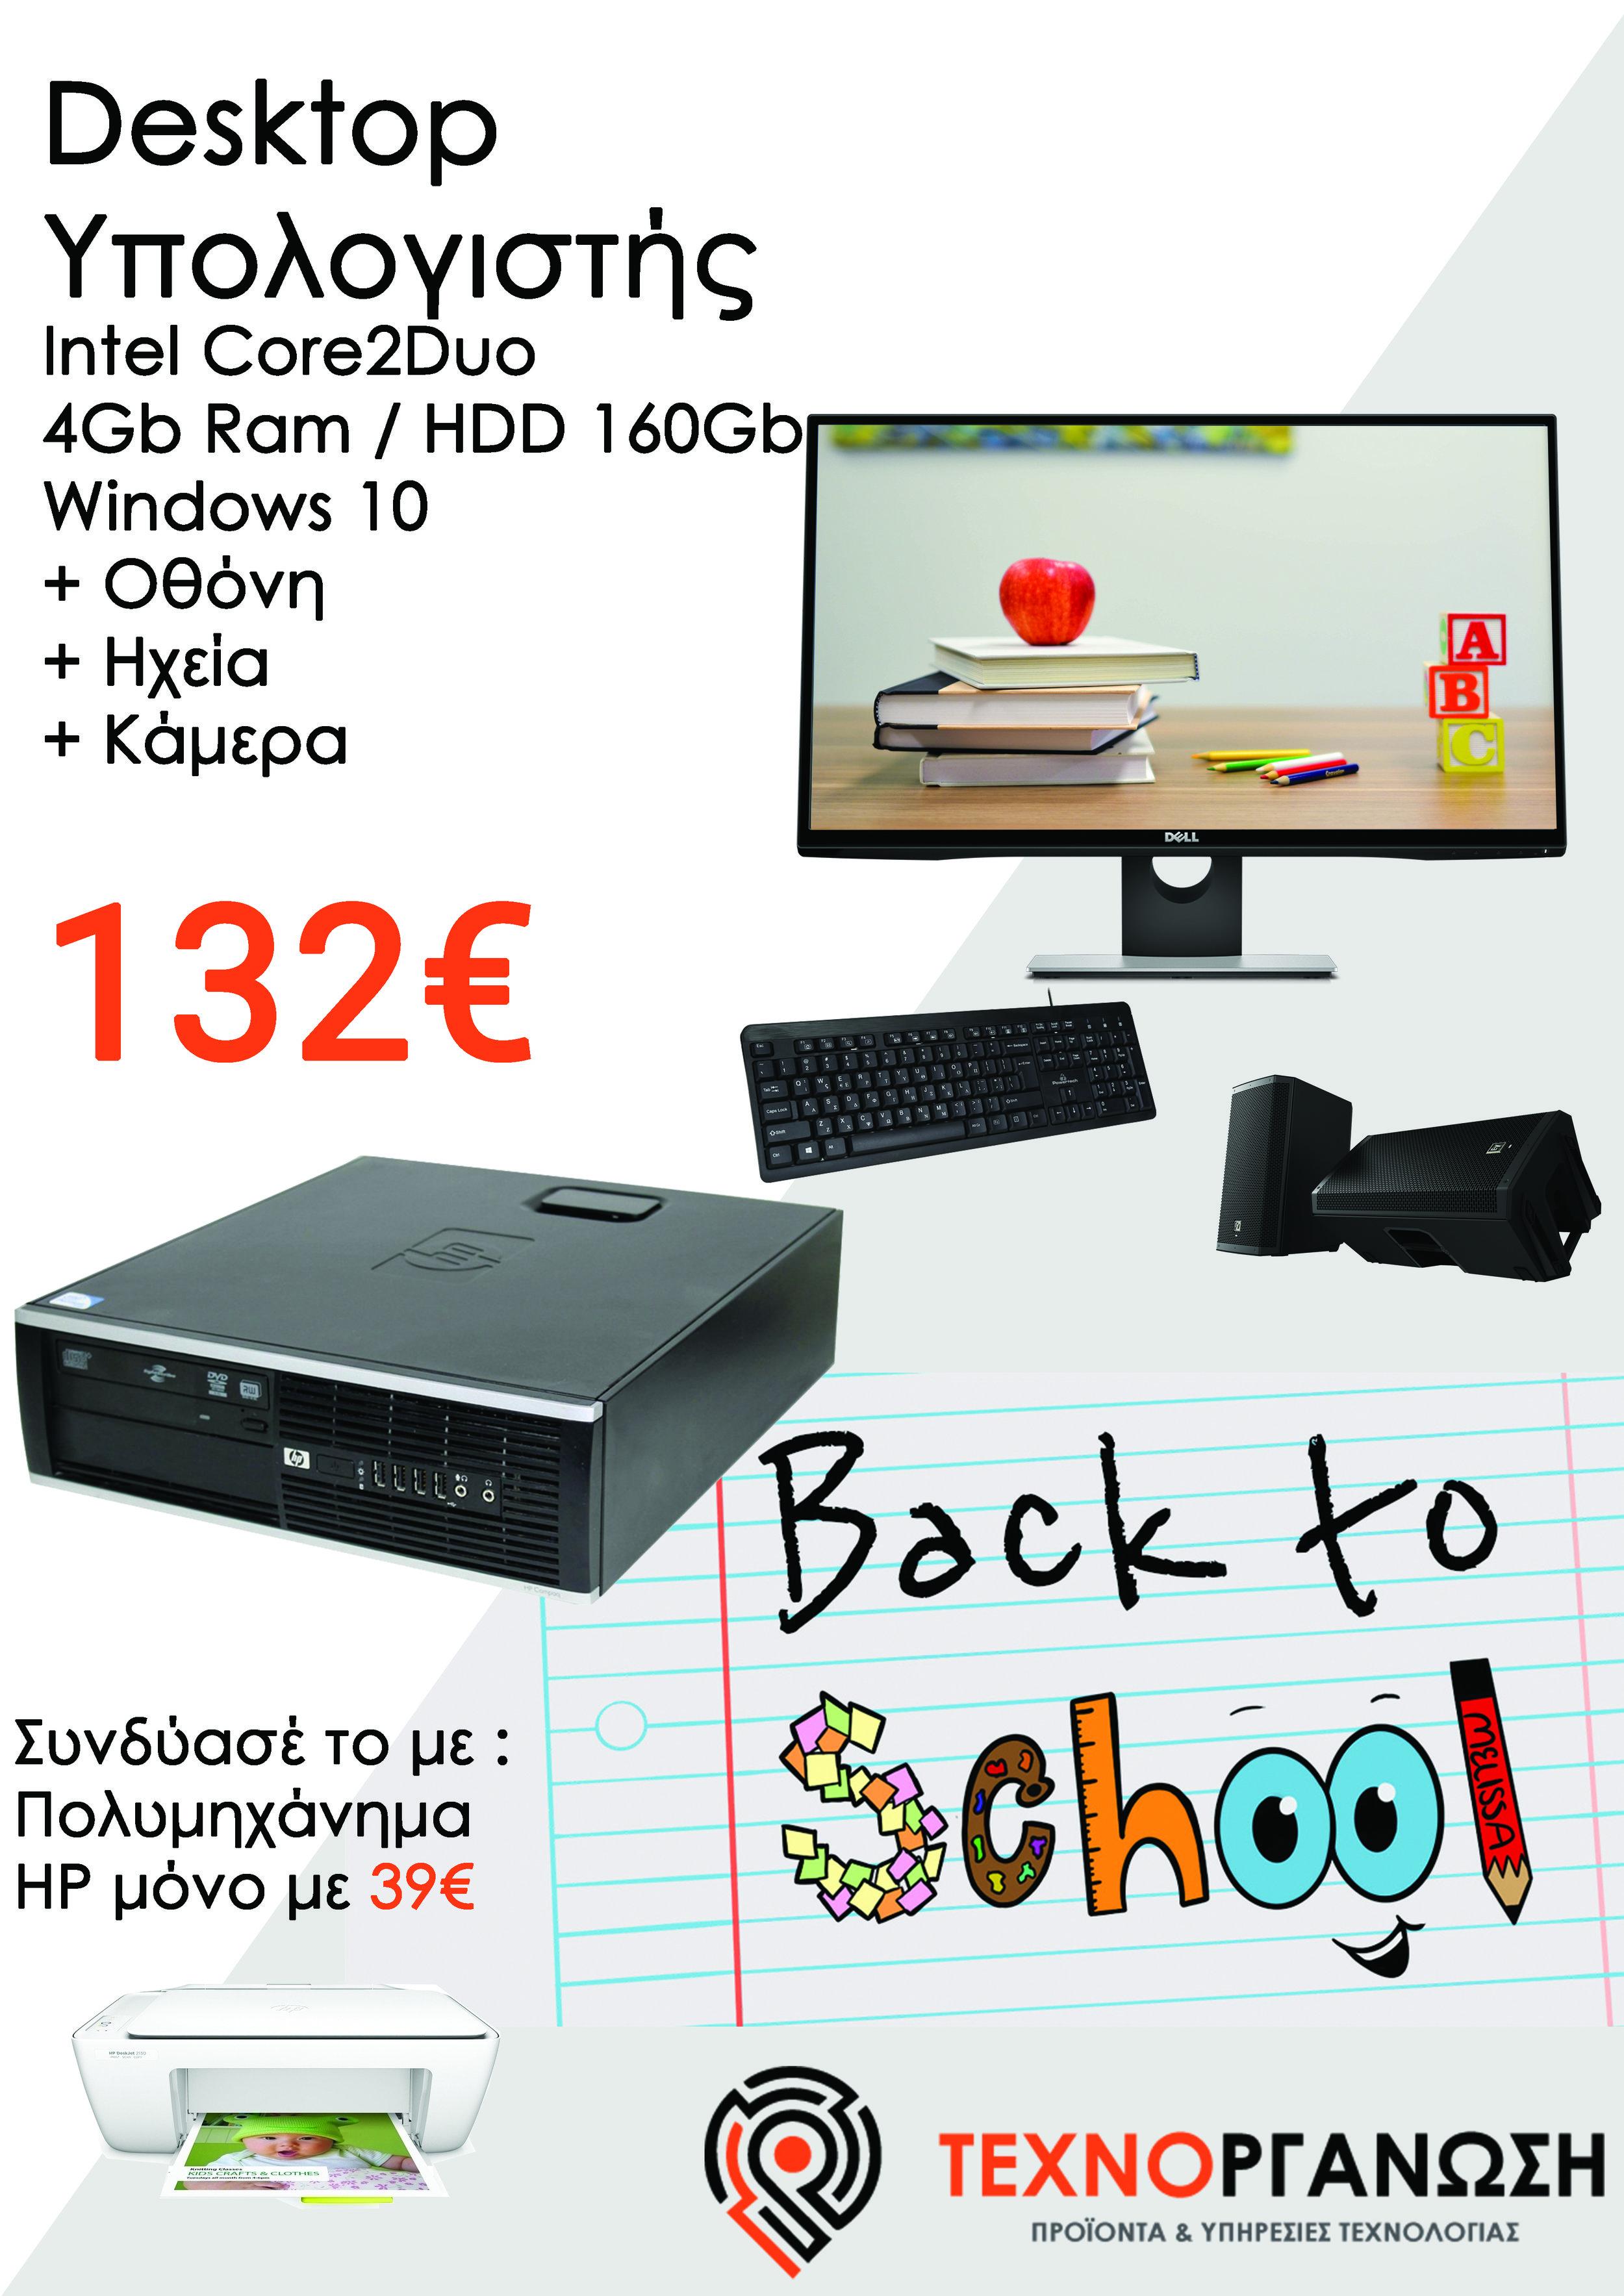 back_to_school_poster____________________-_desktop_core2___printer.jpg